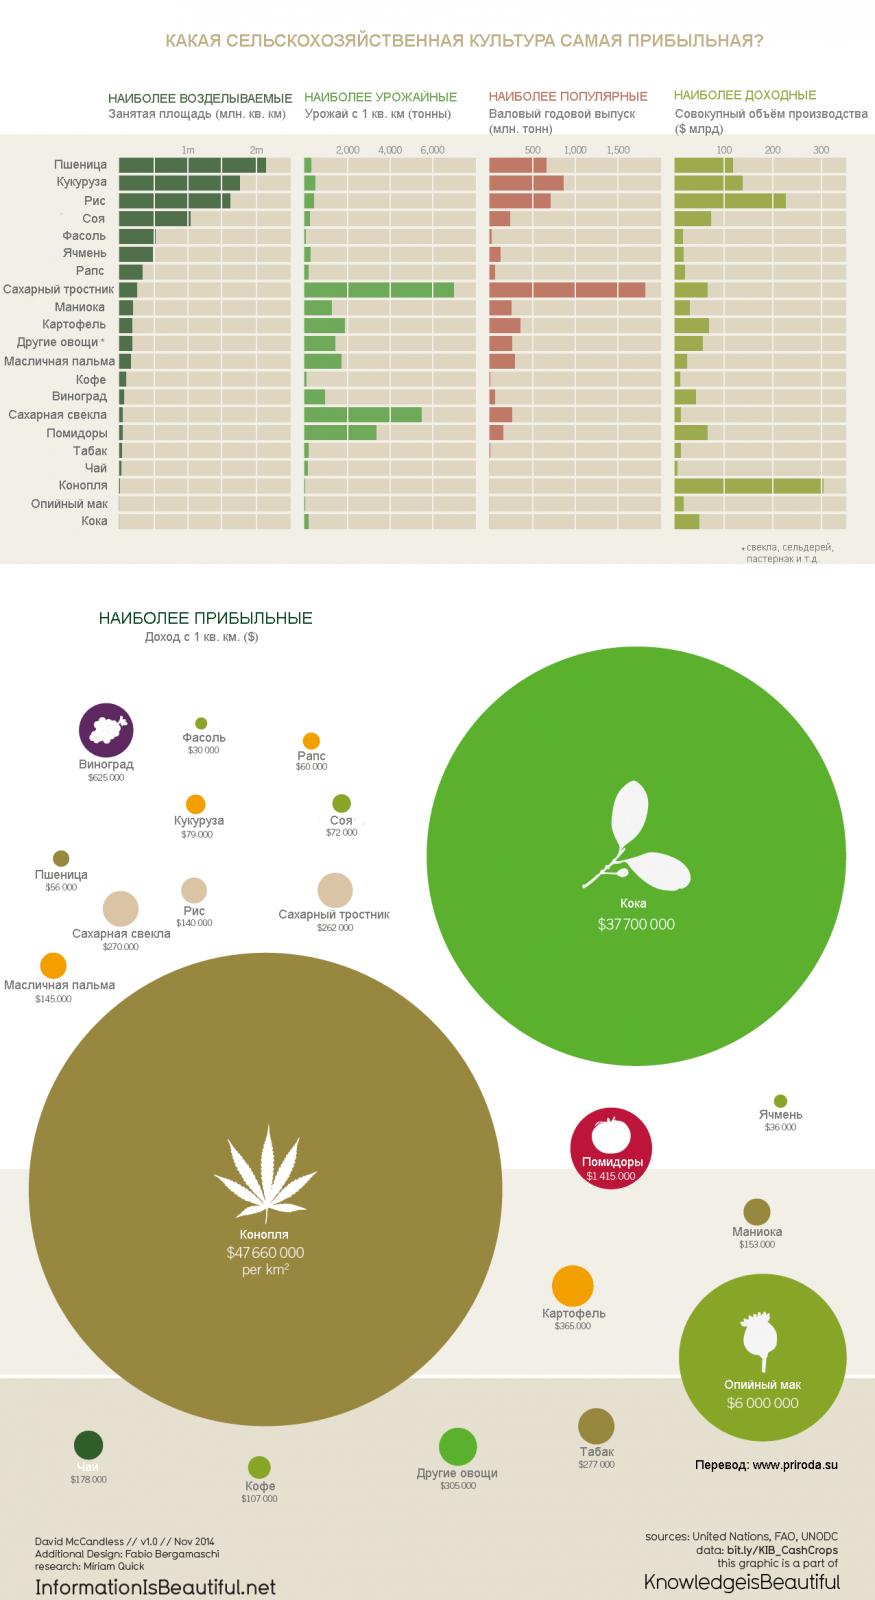 Какая сельскохозяйственная культура самая прибыльная?